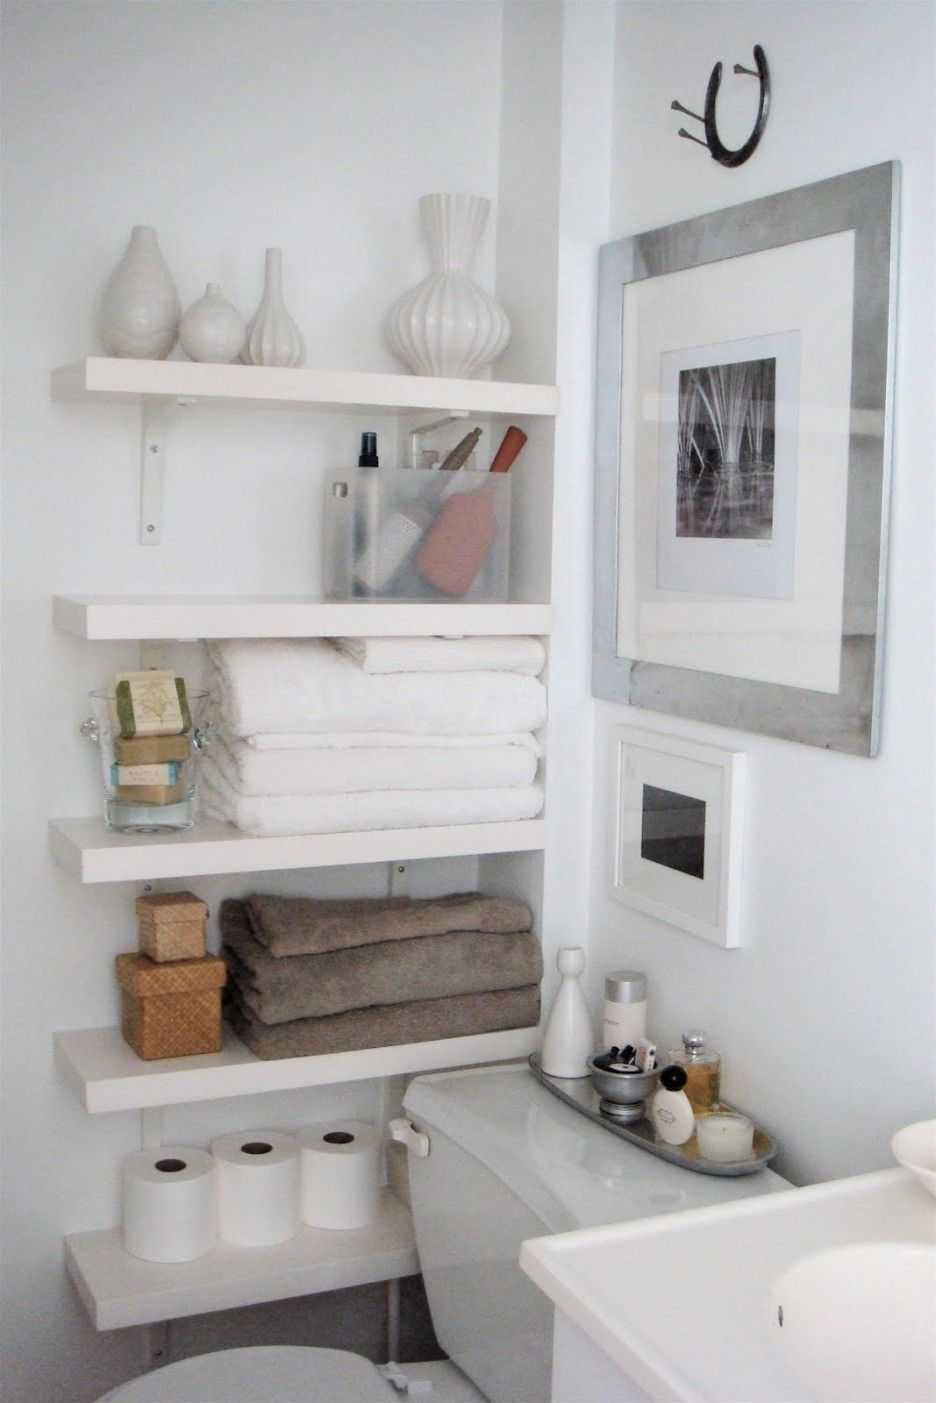 Small Space Organizing Shelving Instant Bathroom Shelves Design ...